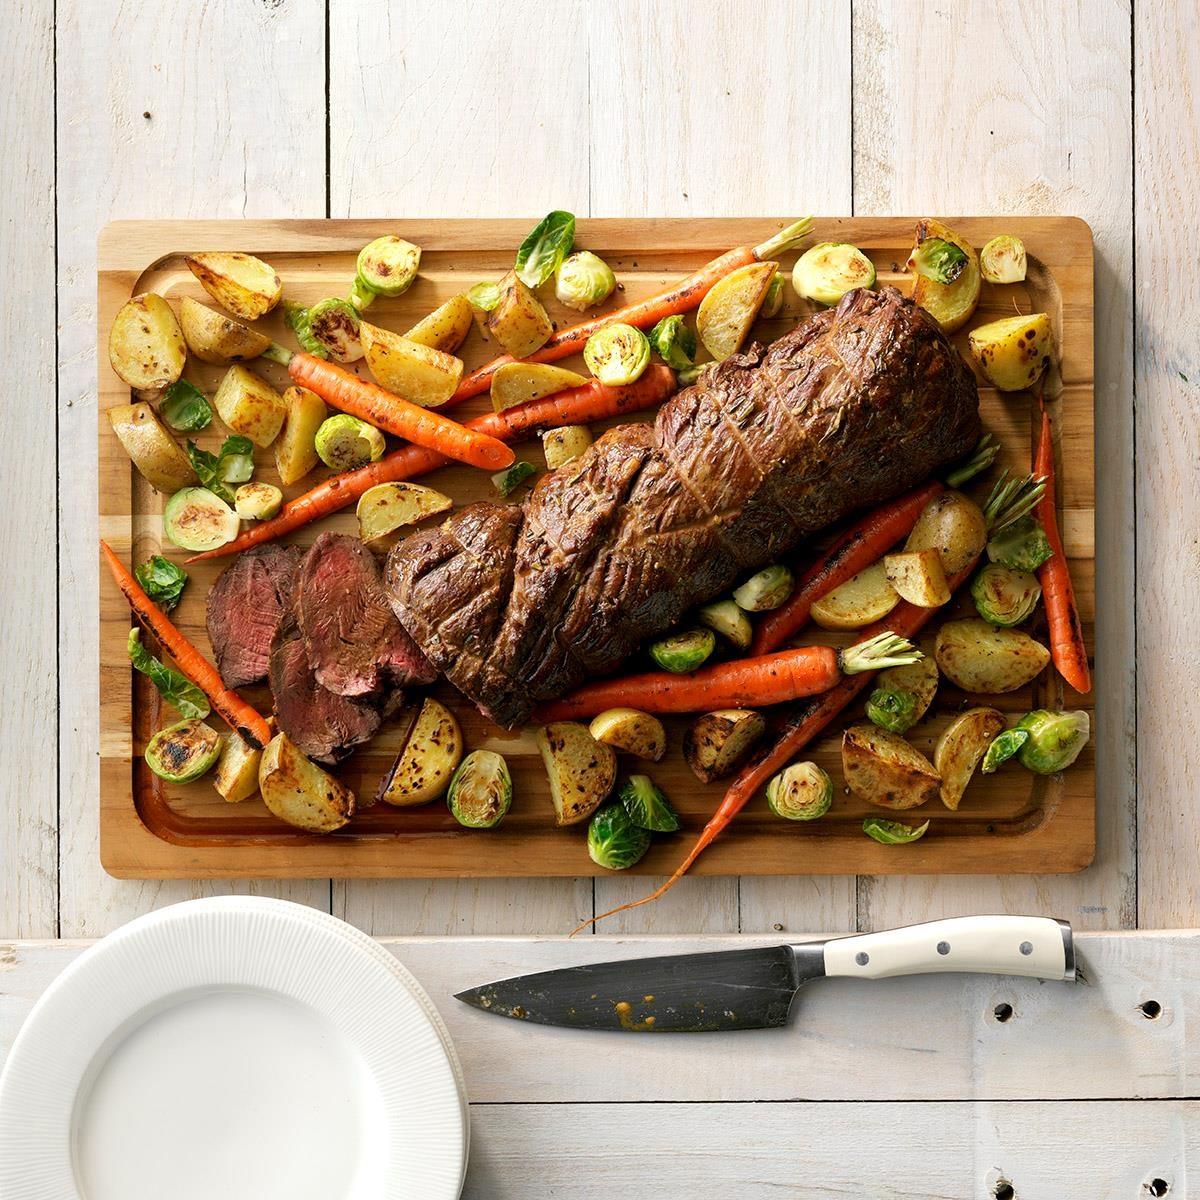 Beef Tenderloin With Roasted Vegetables Recipe Taste Of Home